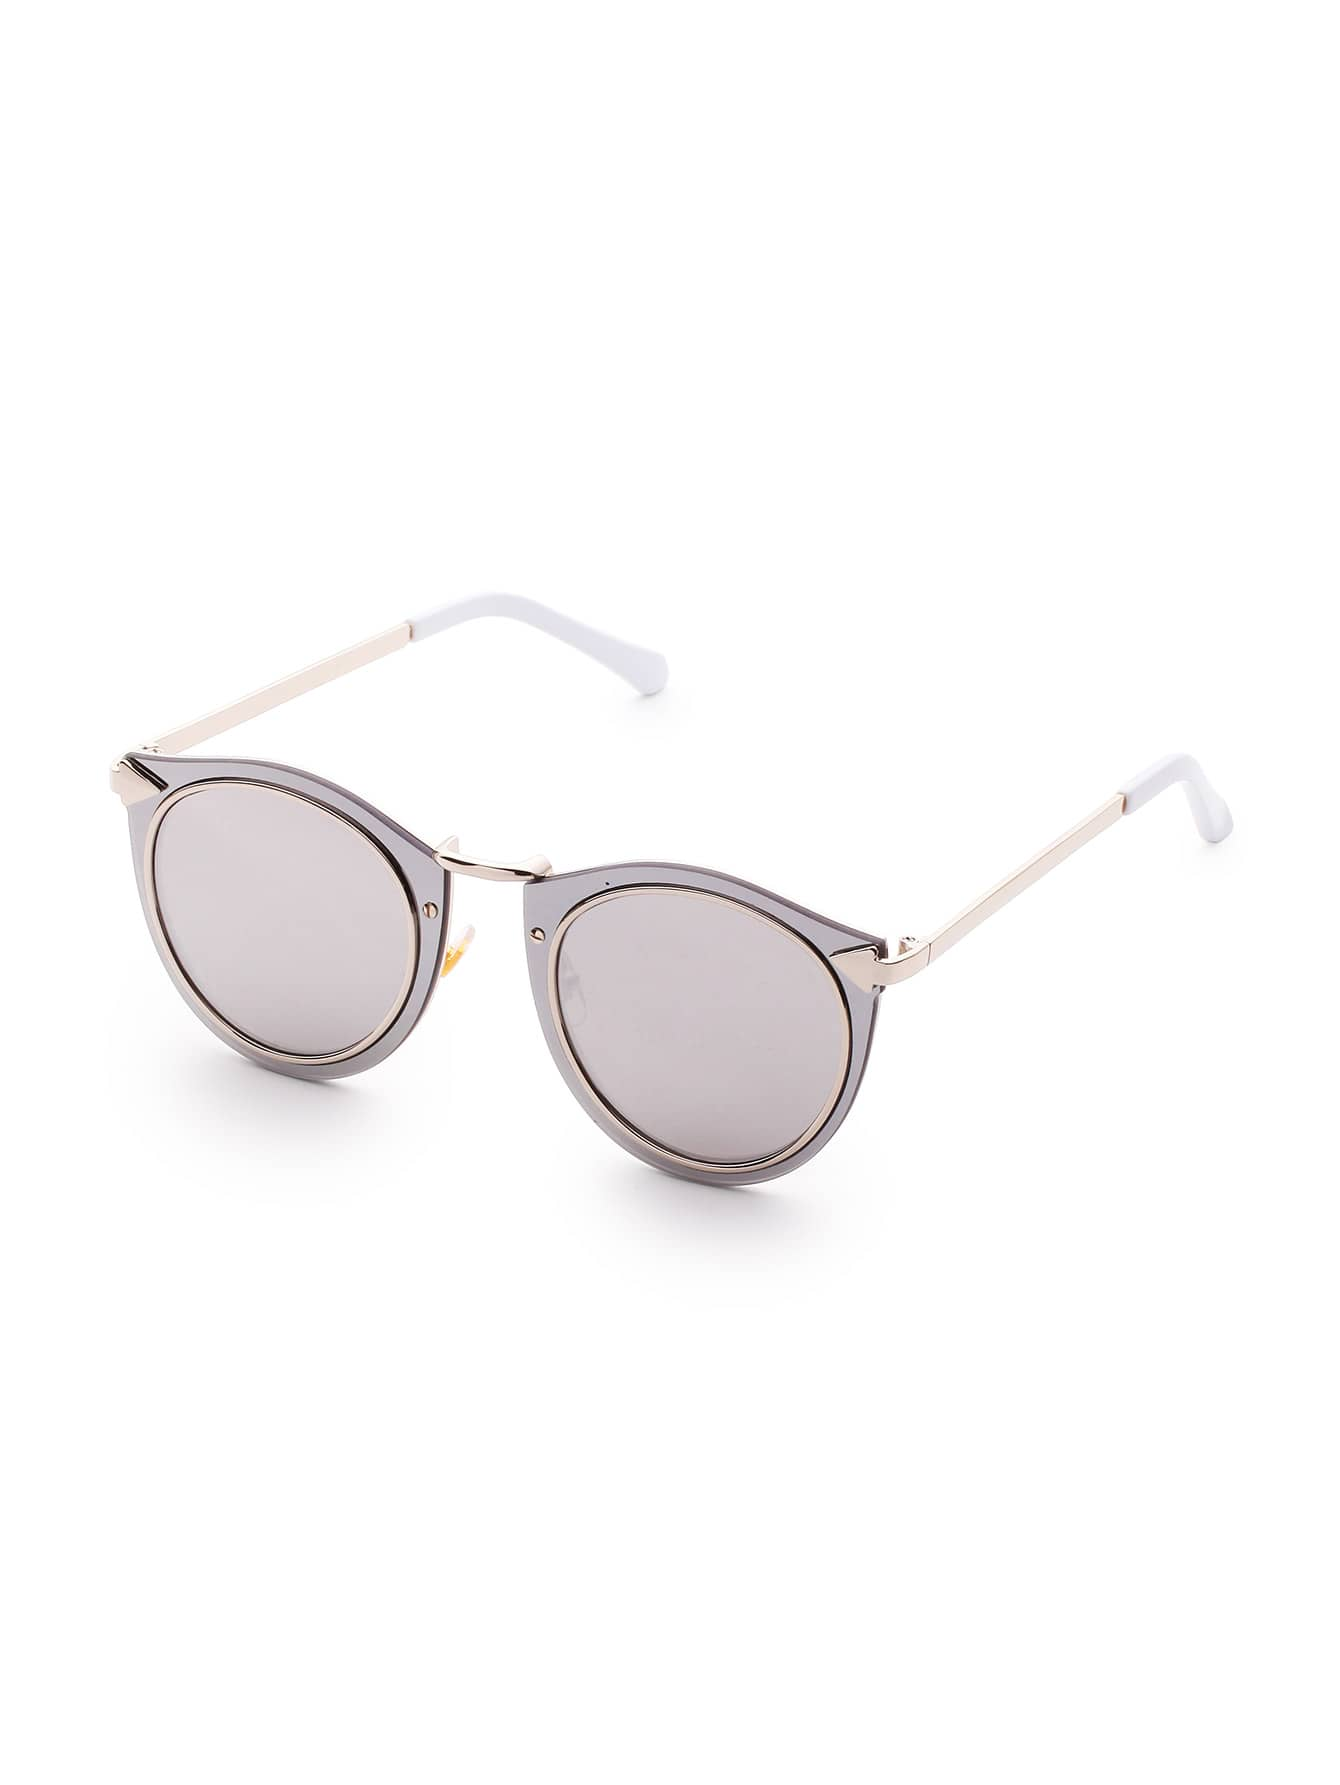 Double Frame Grey Lens Sunglasses